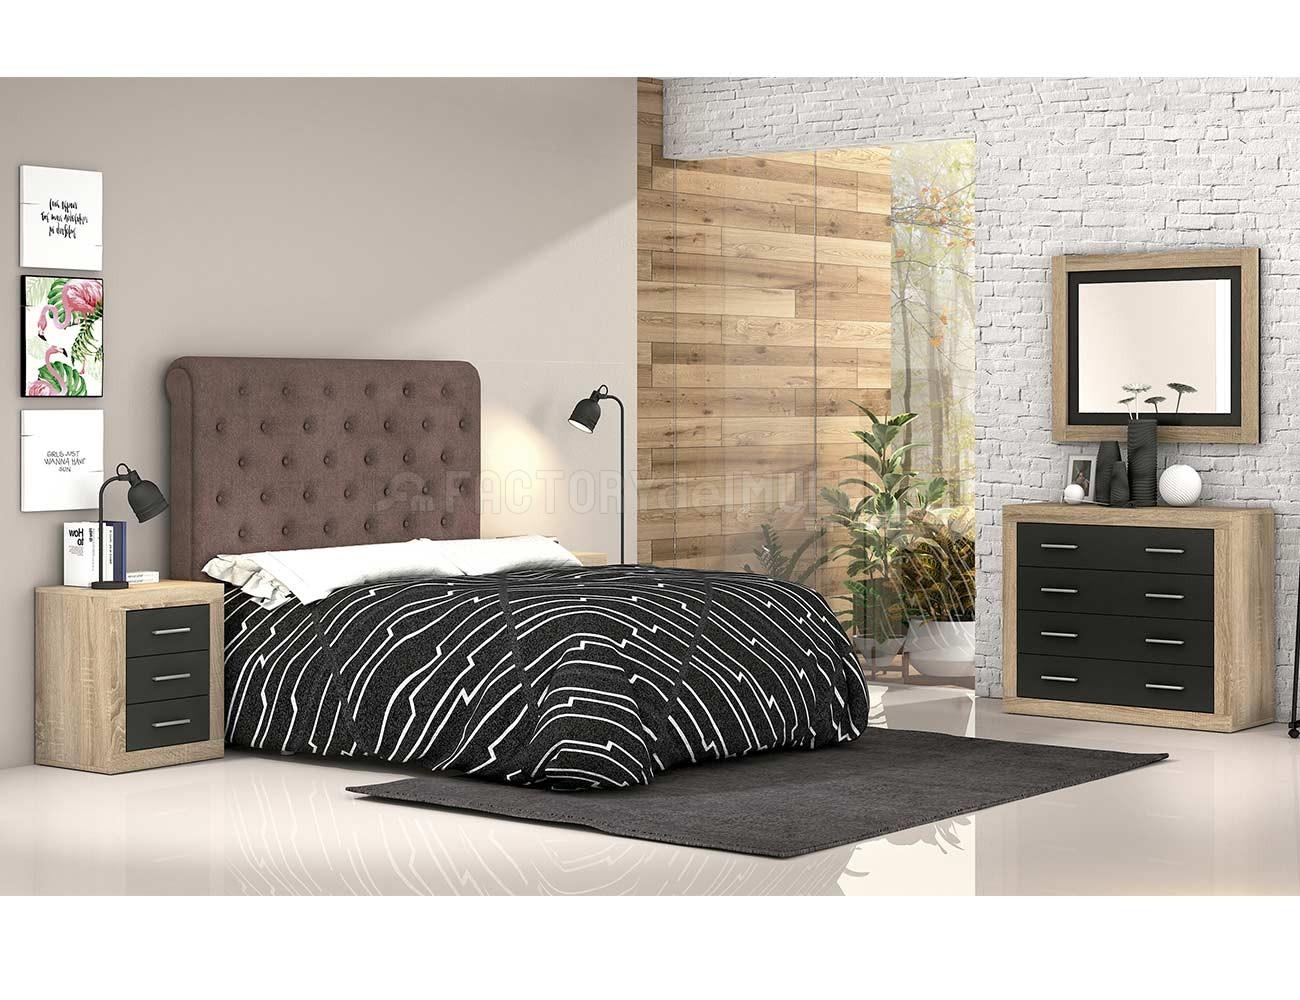 Dormitorio matrimonio moderno 521